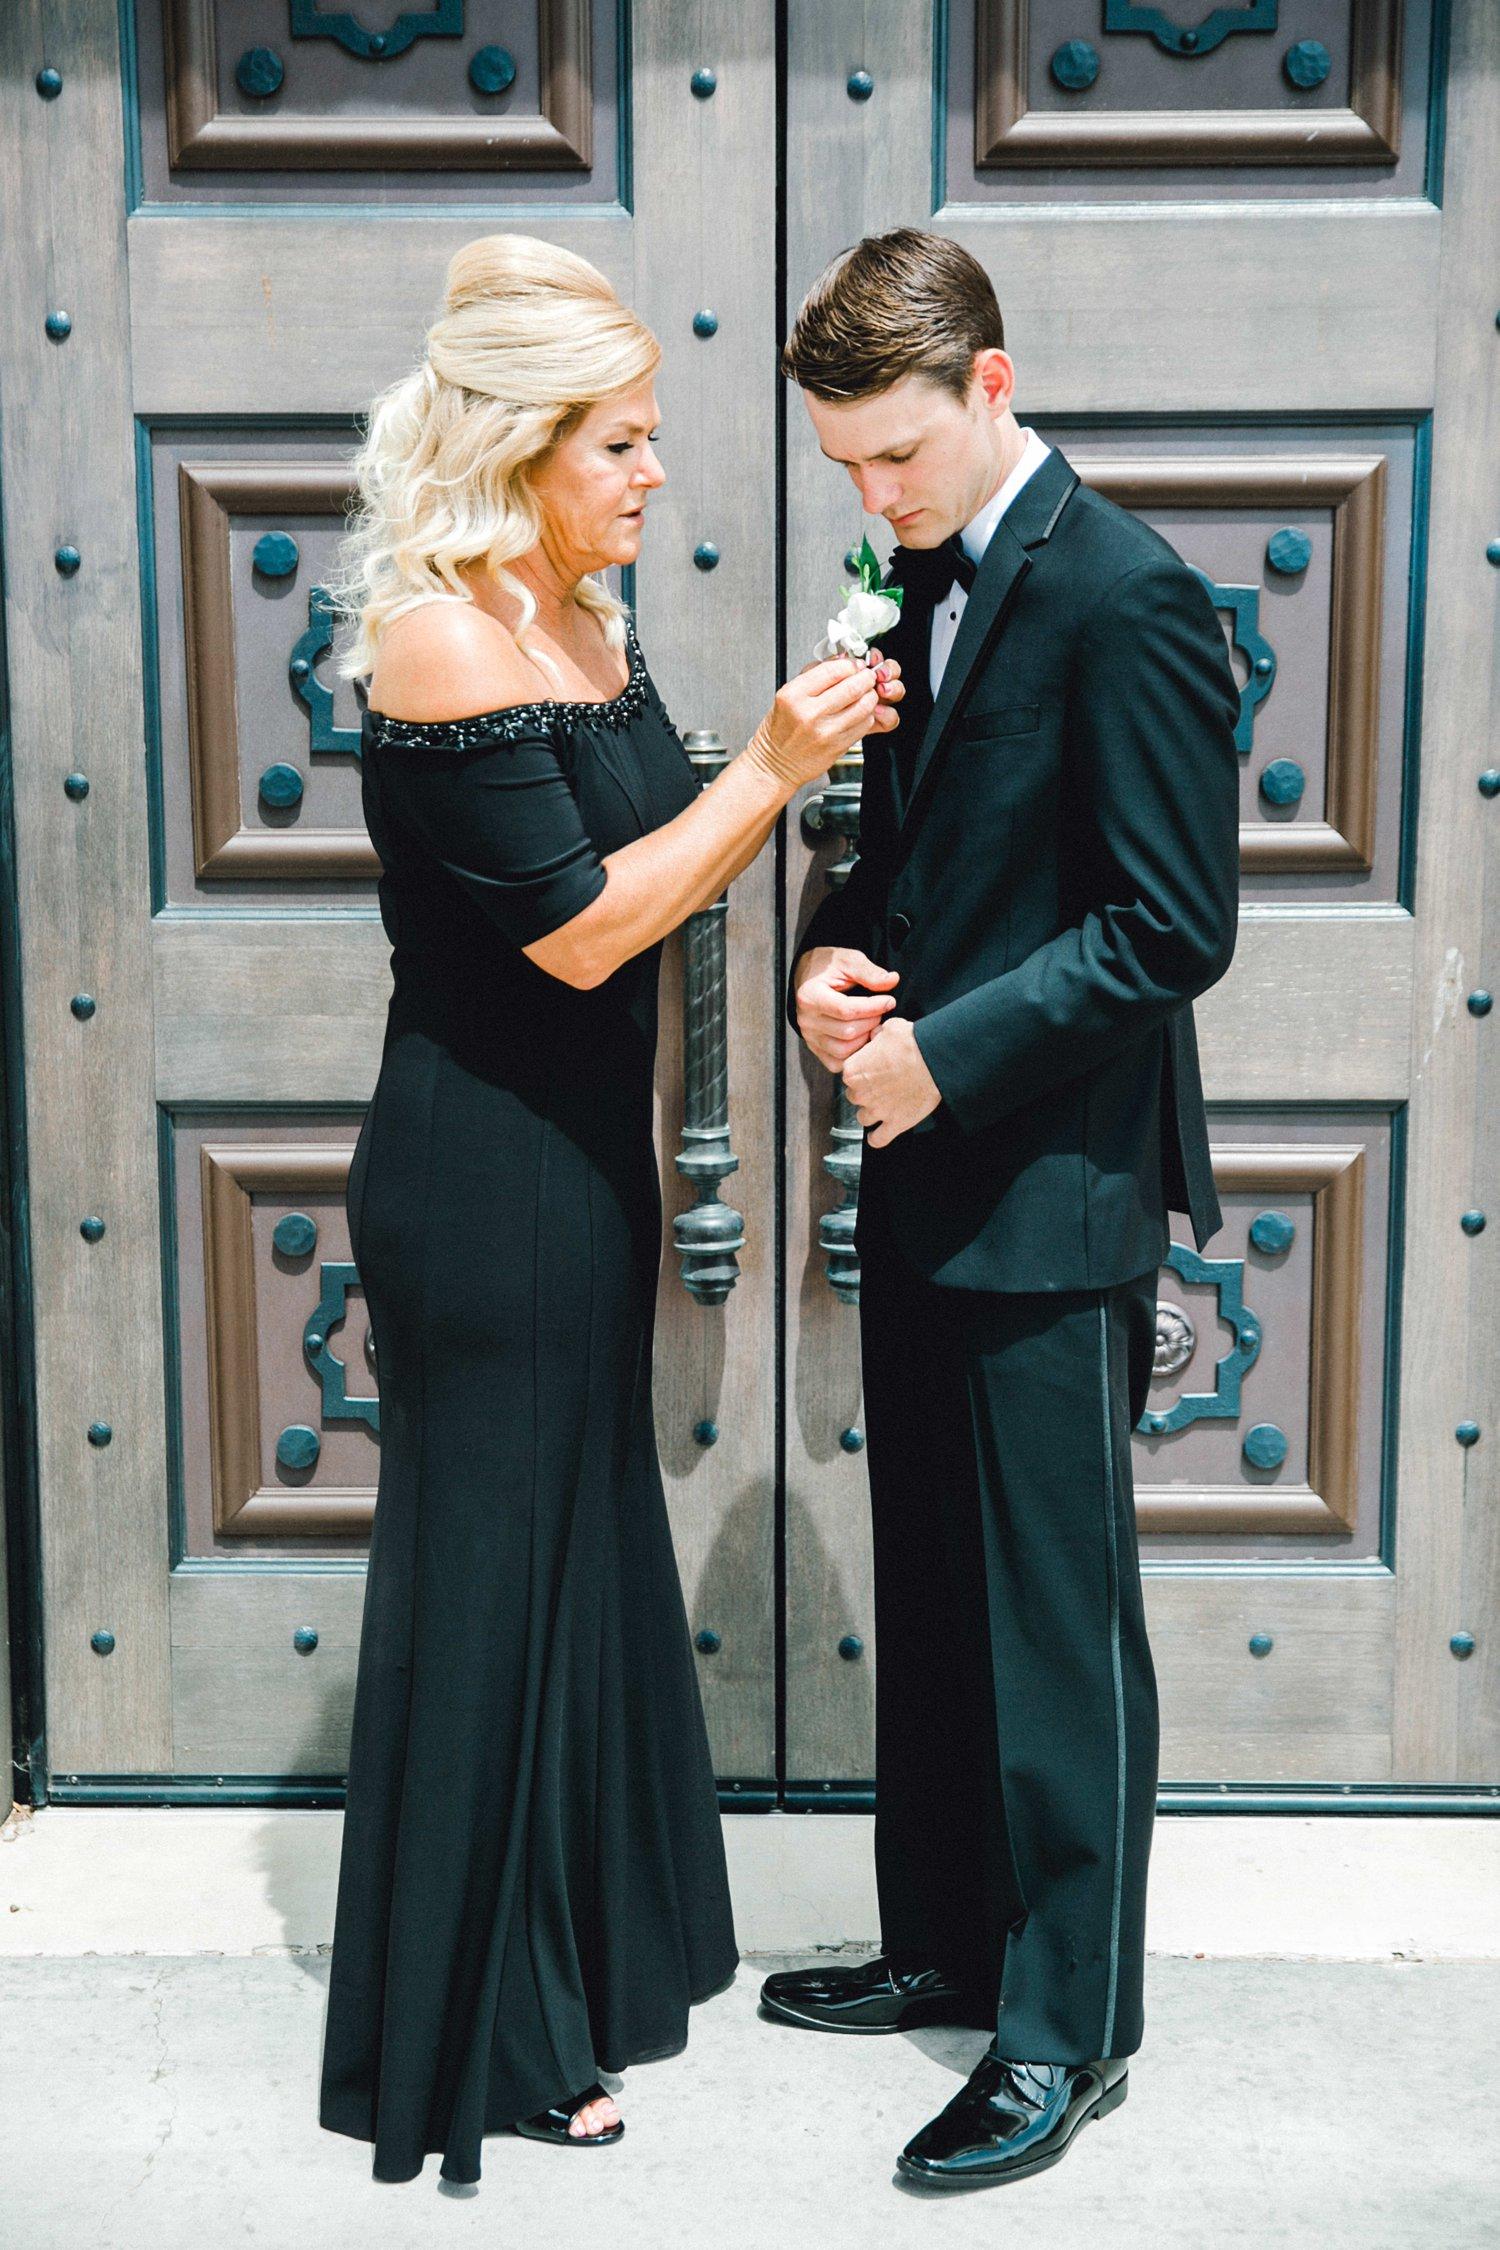 Taylor-and-Brock-Williams-Texas-Tech-University-Merket-Alumni-Center-Lubbock-Photographer-ALLEEJ0028.jpg